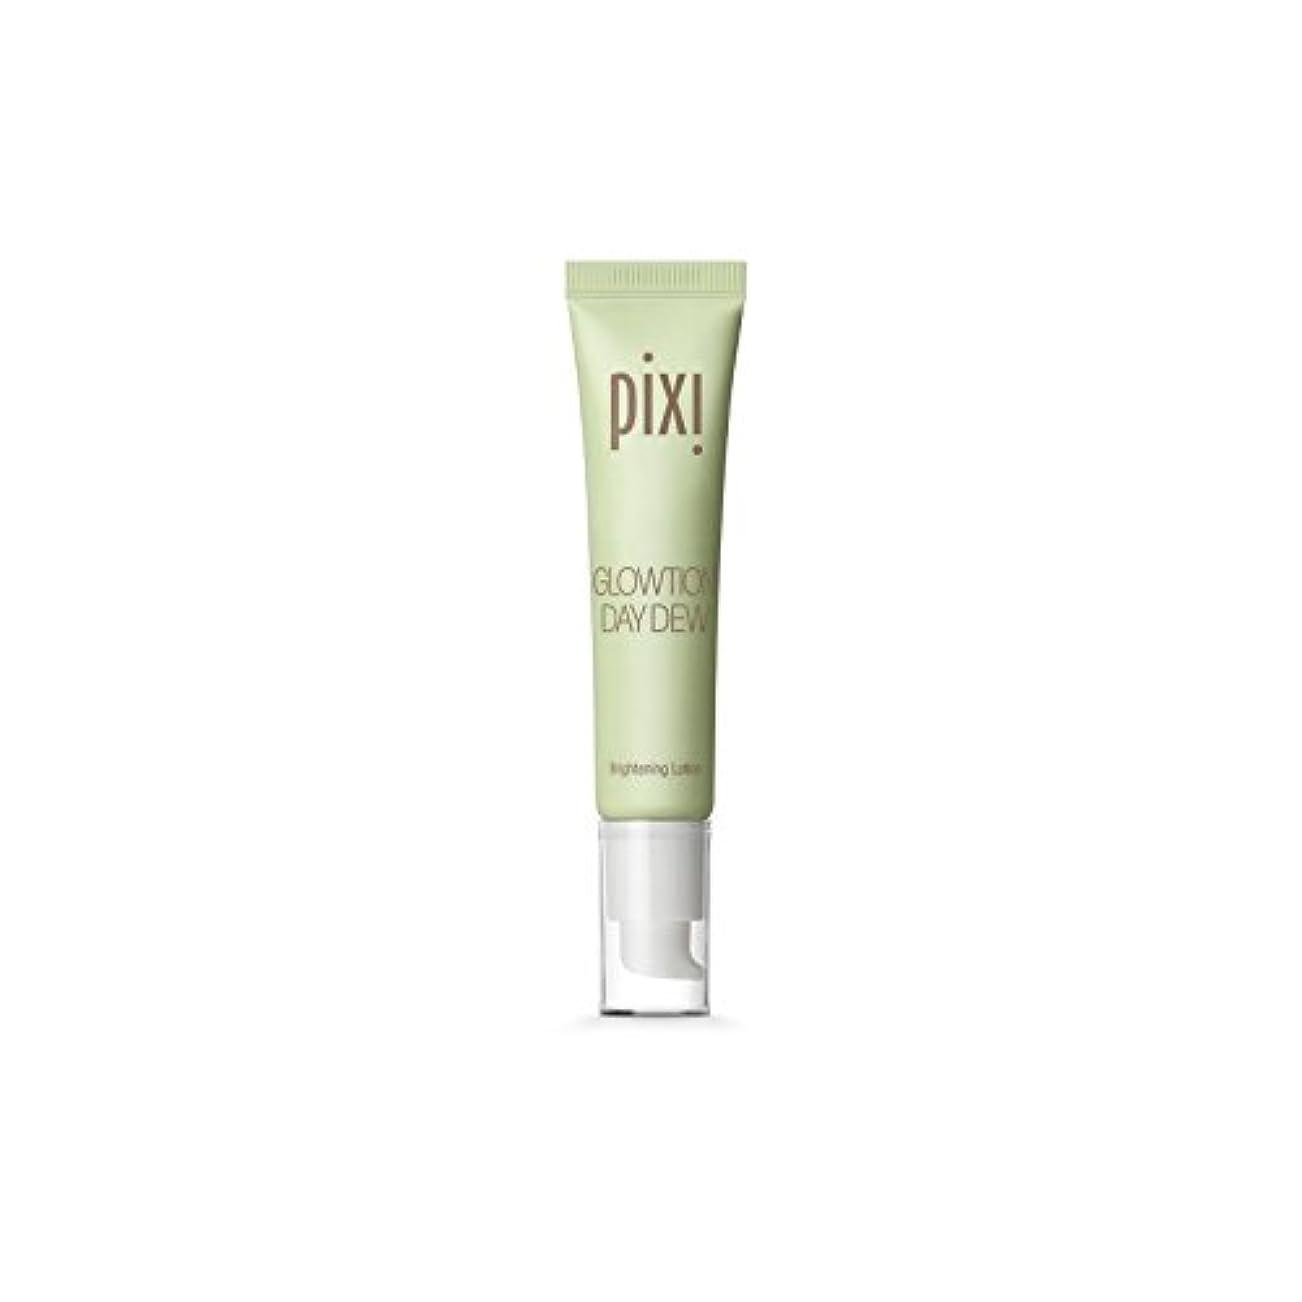 ポータブル悲劇日付日露 x2 - Pixi Pixi Glowtion Day Dew (Pack of 2) [並行輸入品]